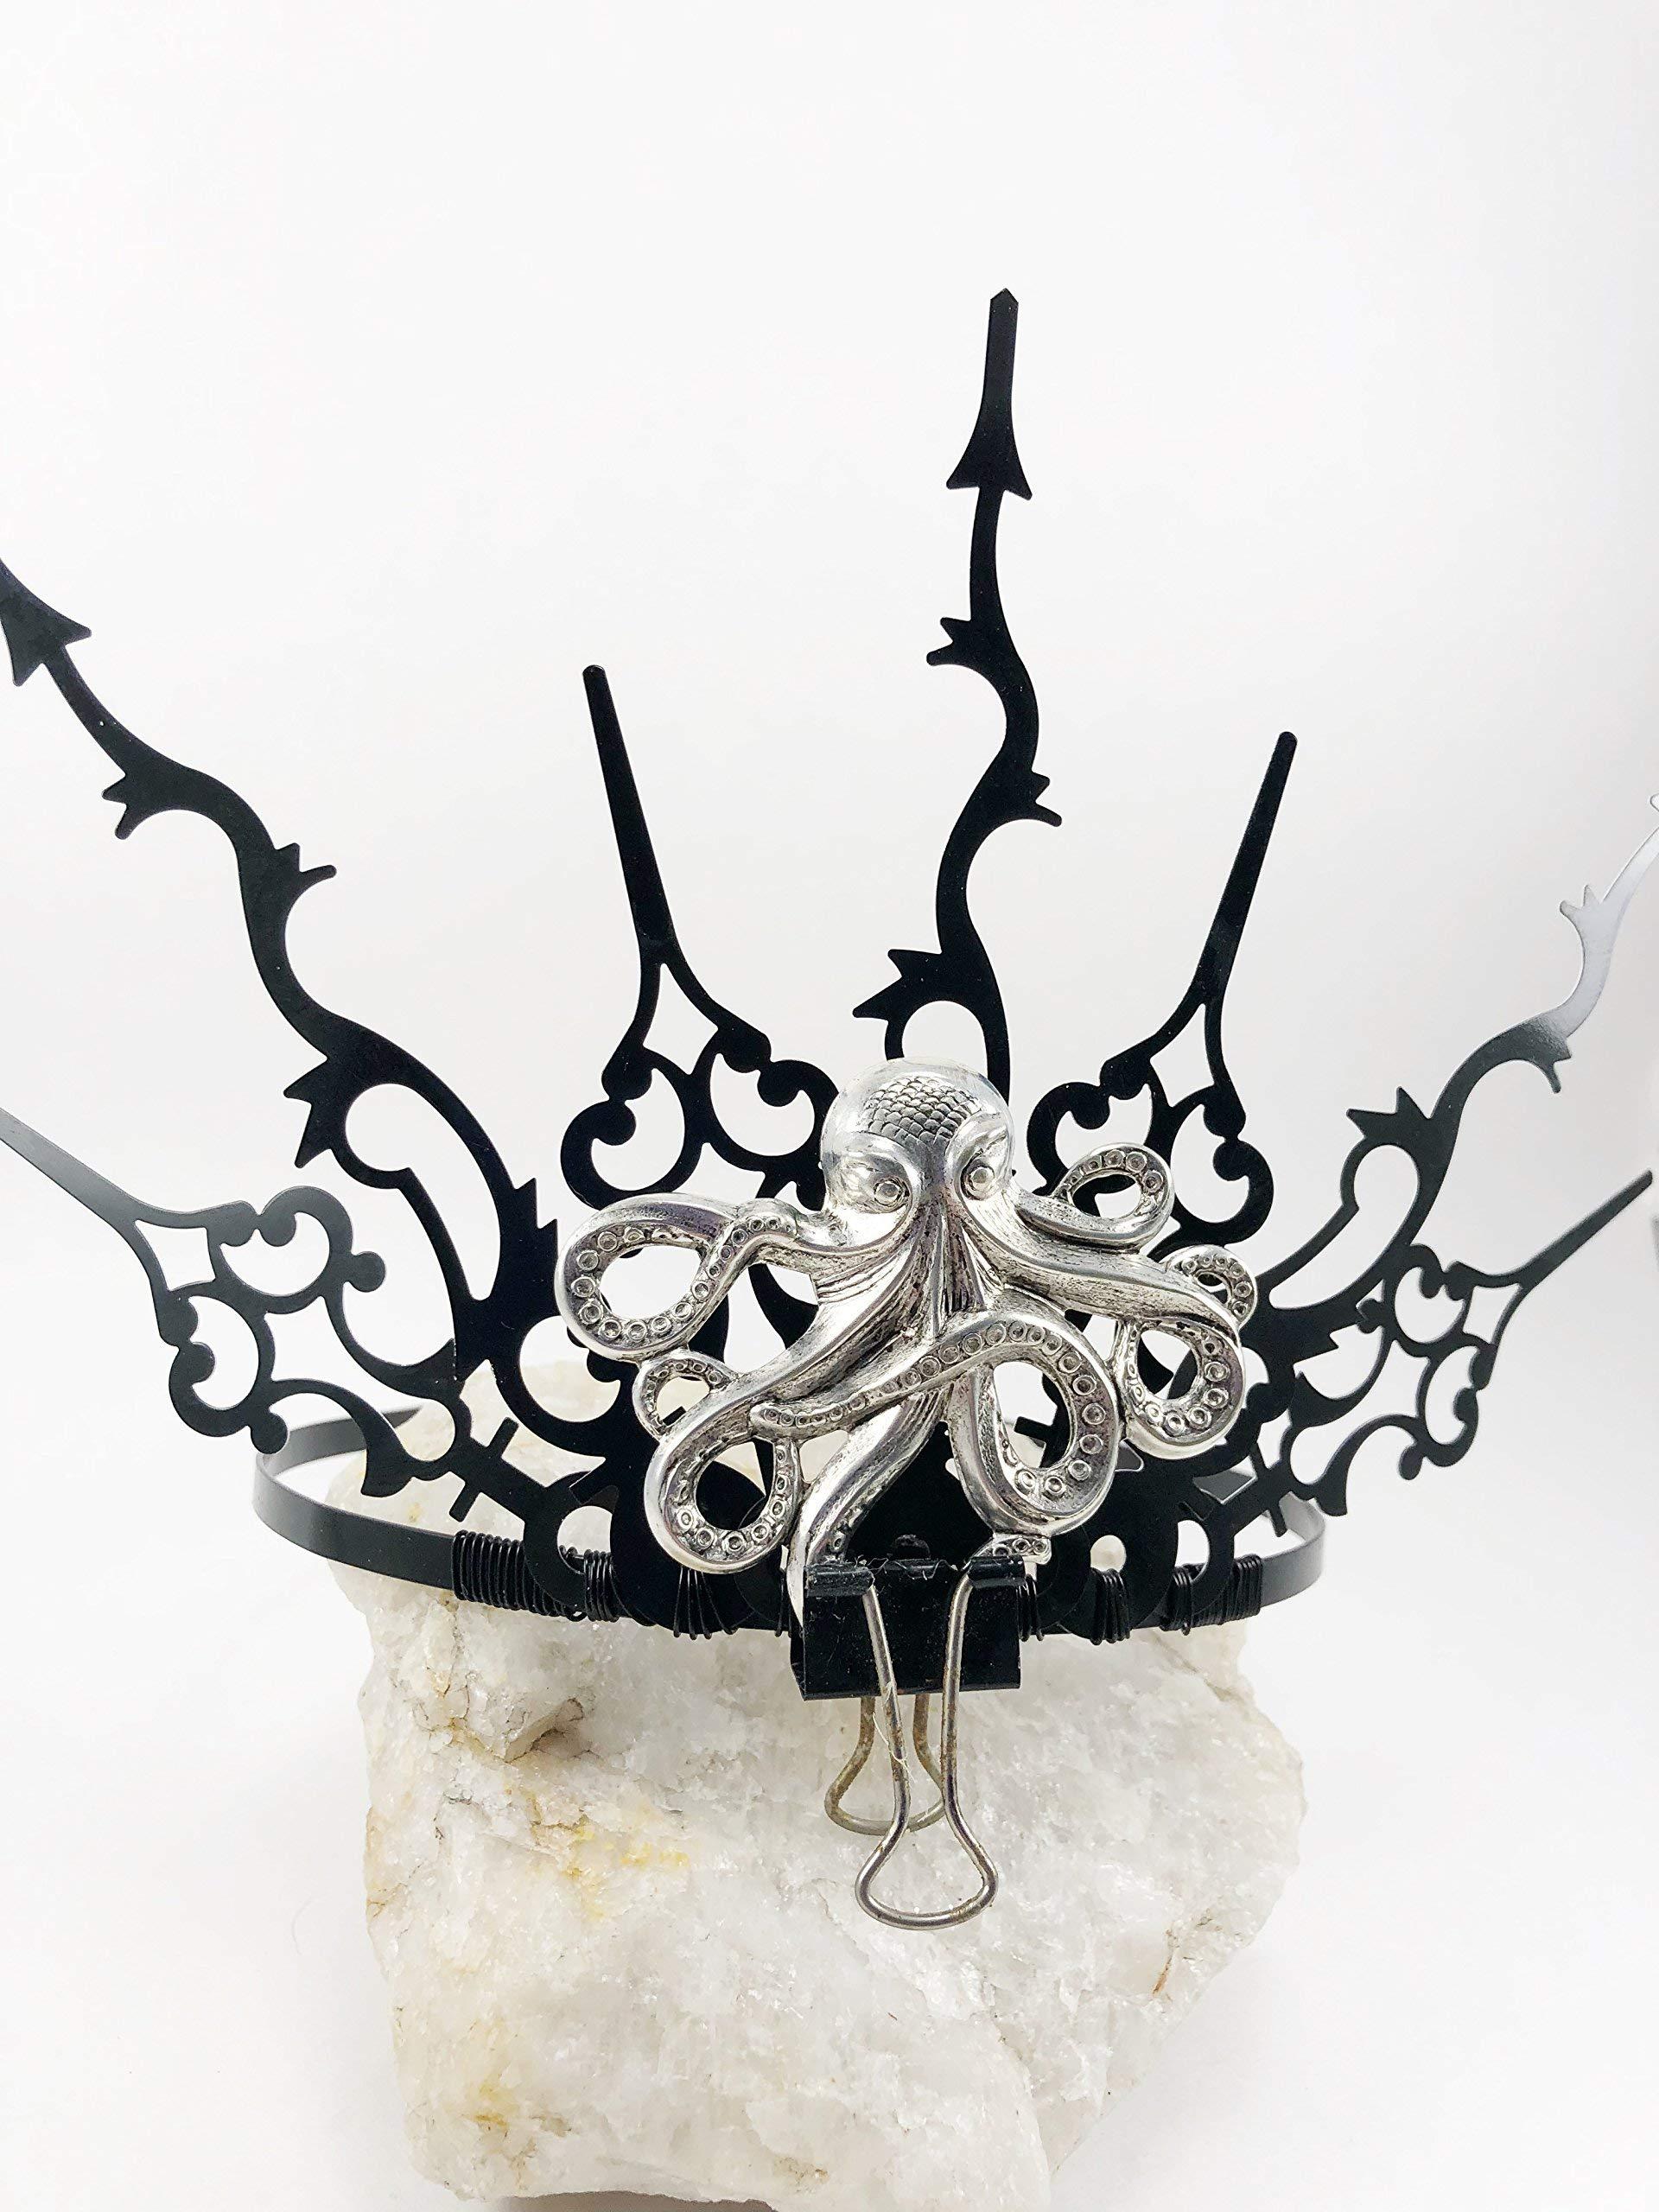 Evil Queen Crown Ursula Tiara Octopus Tiara Steampunk Clock Hand TIARA Crown, Elven Fairy Costume Tiara, Black Gothic Tiara